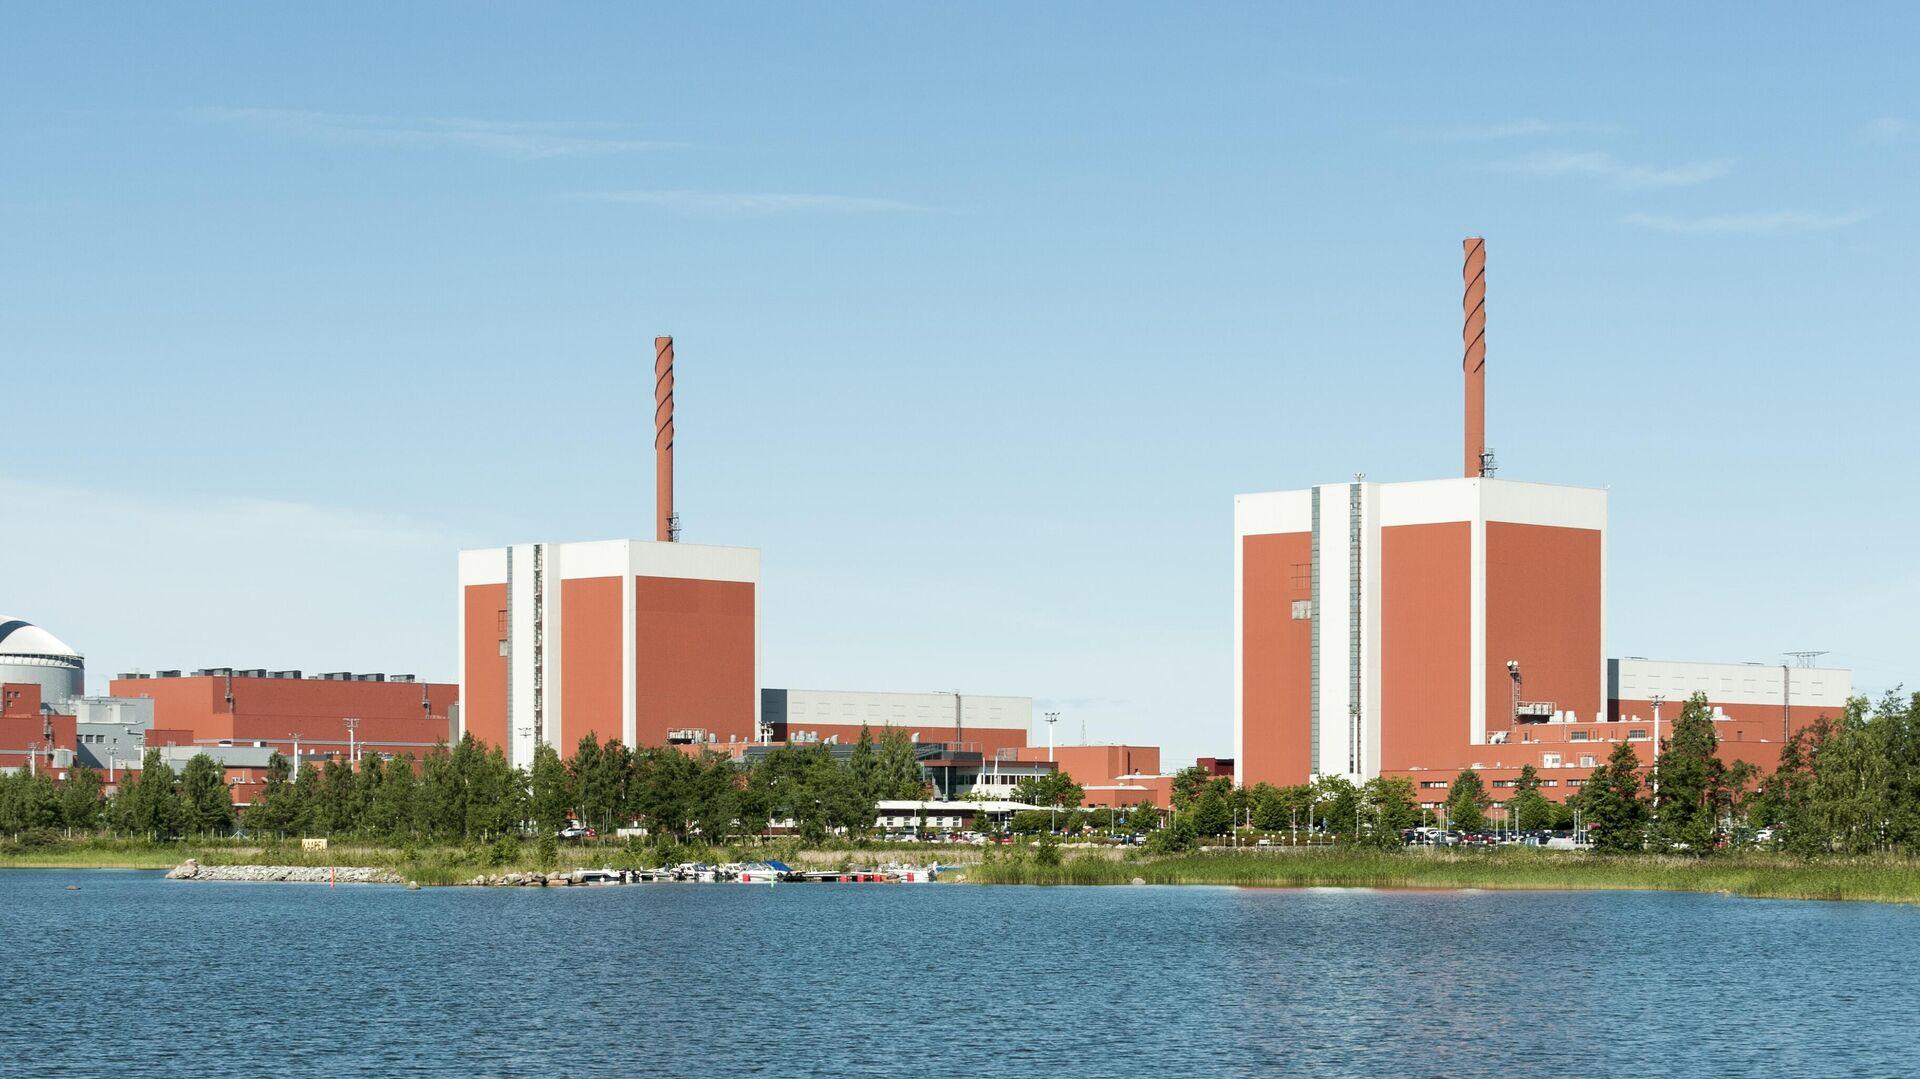 Атомная электростанция Олкилуото в Финляндии - РИА Новости, 1920, 11.12.2020